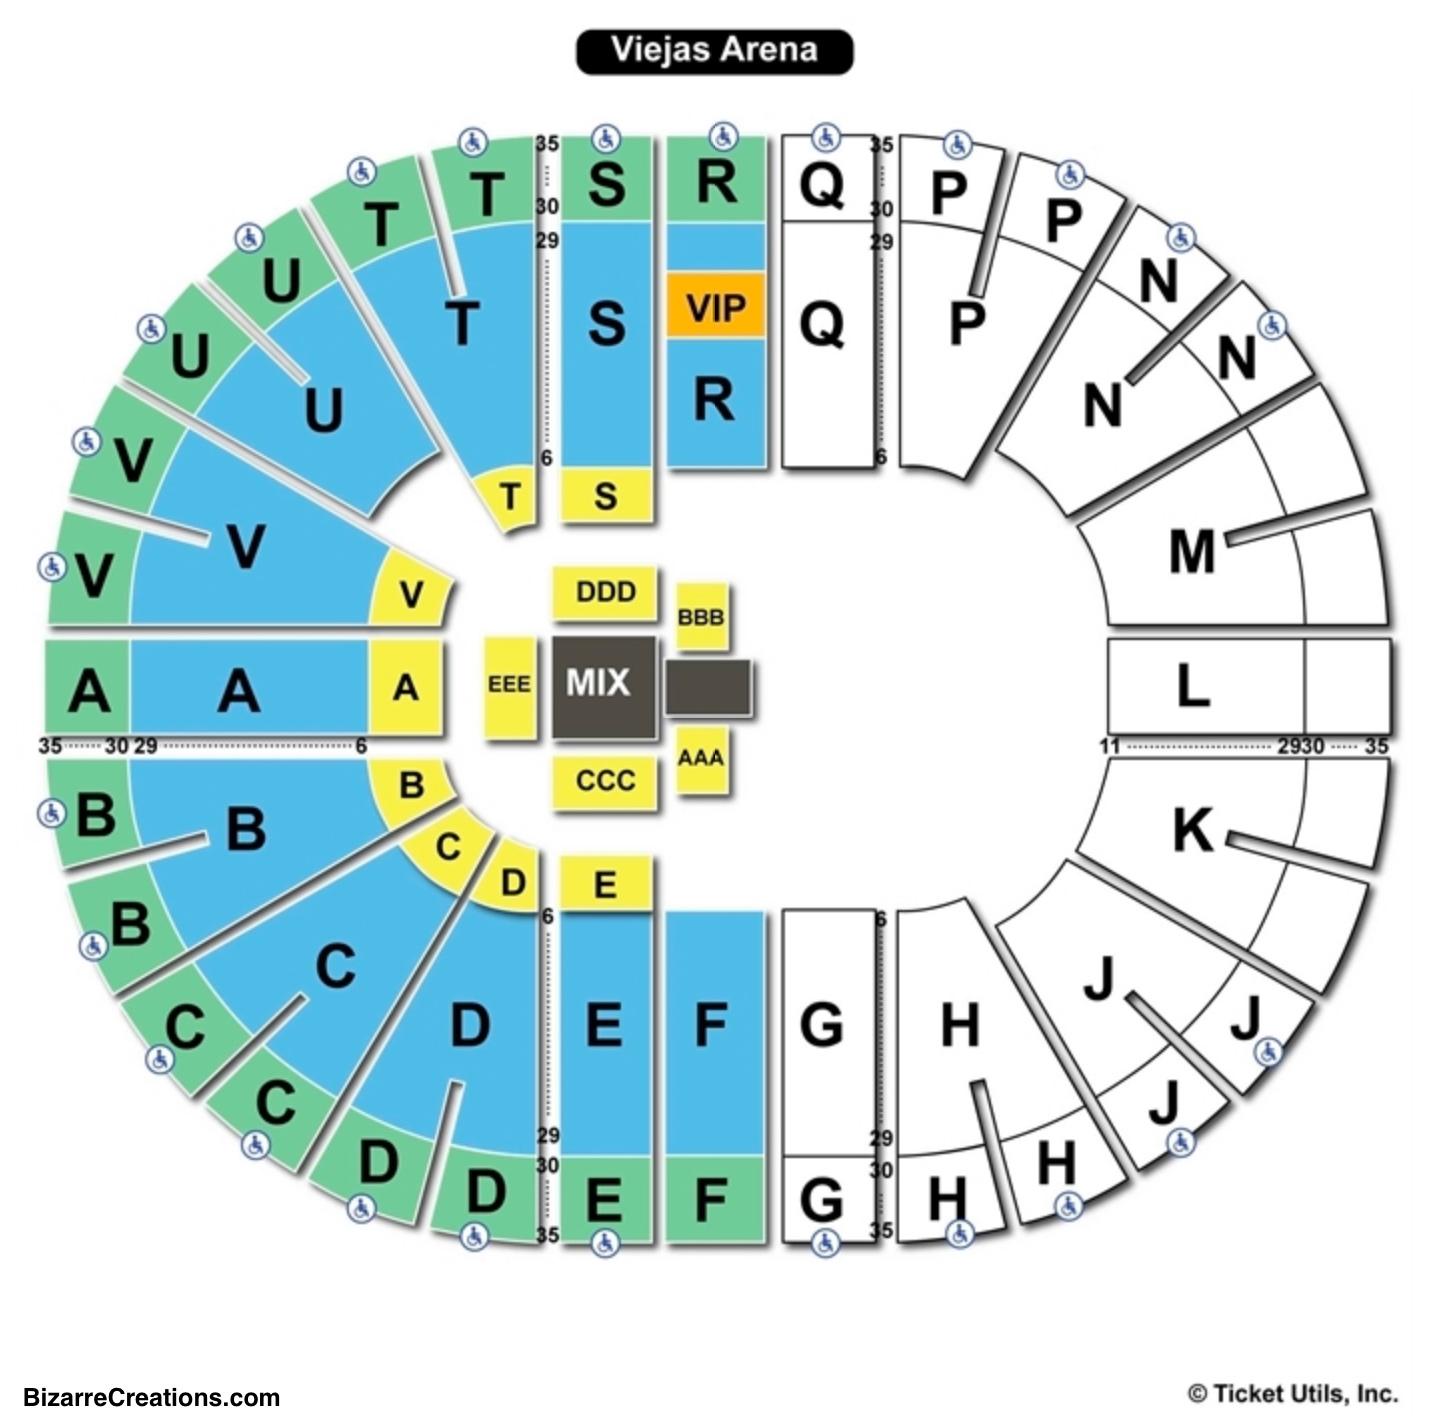 Viejas Arena Seating Chart WWE